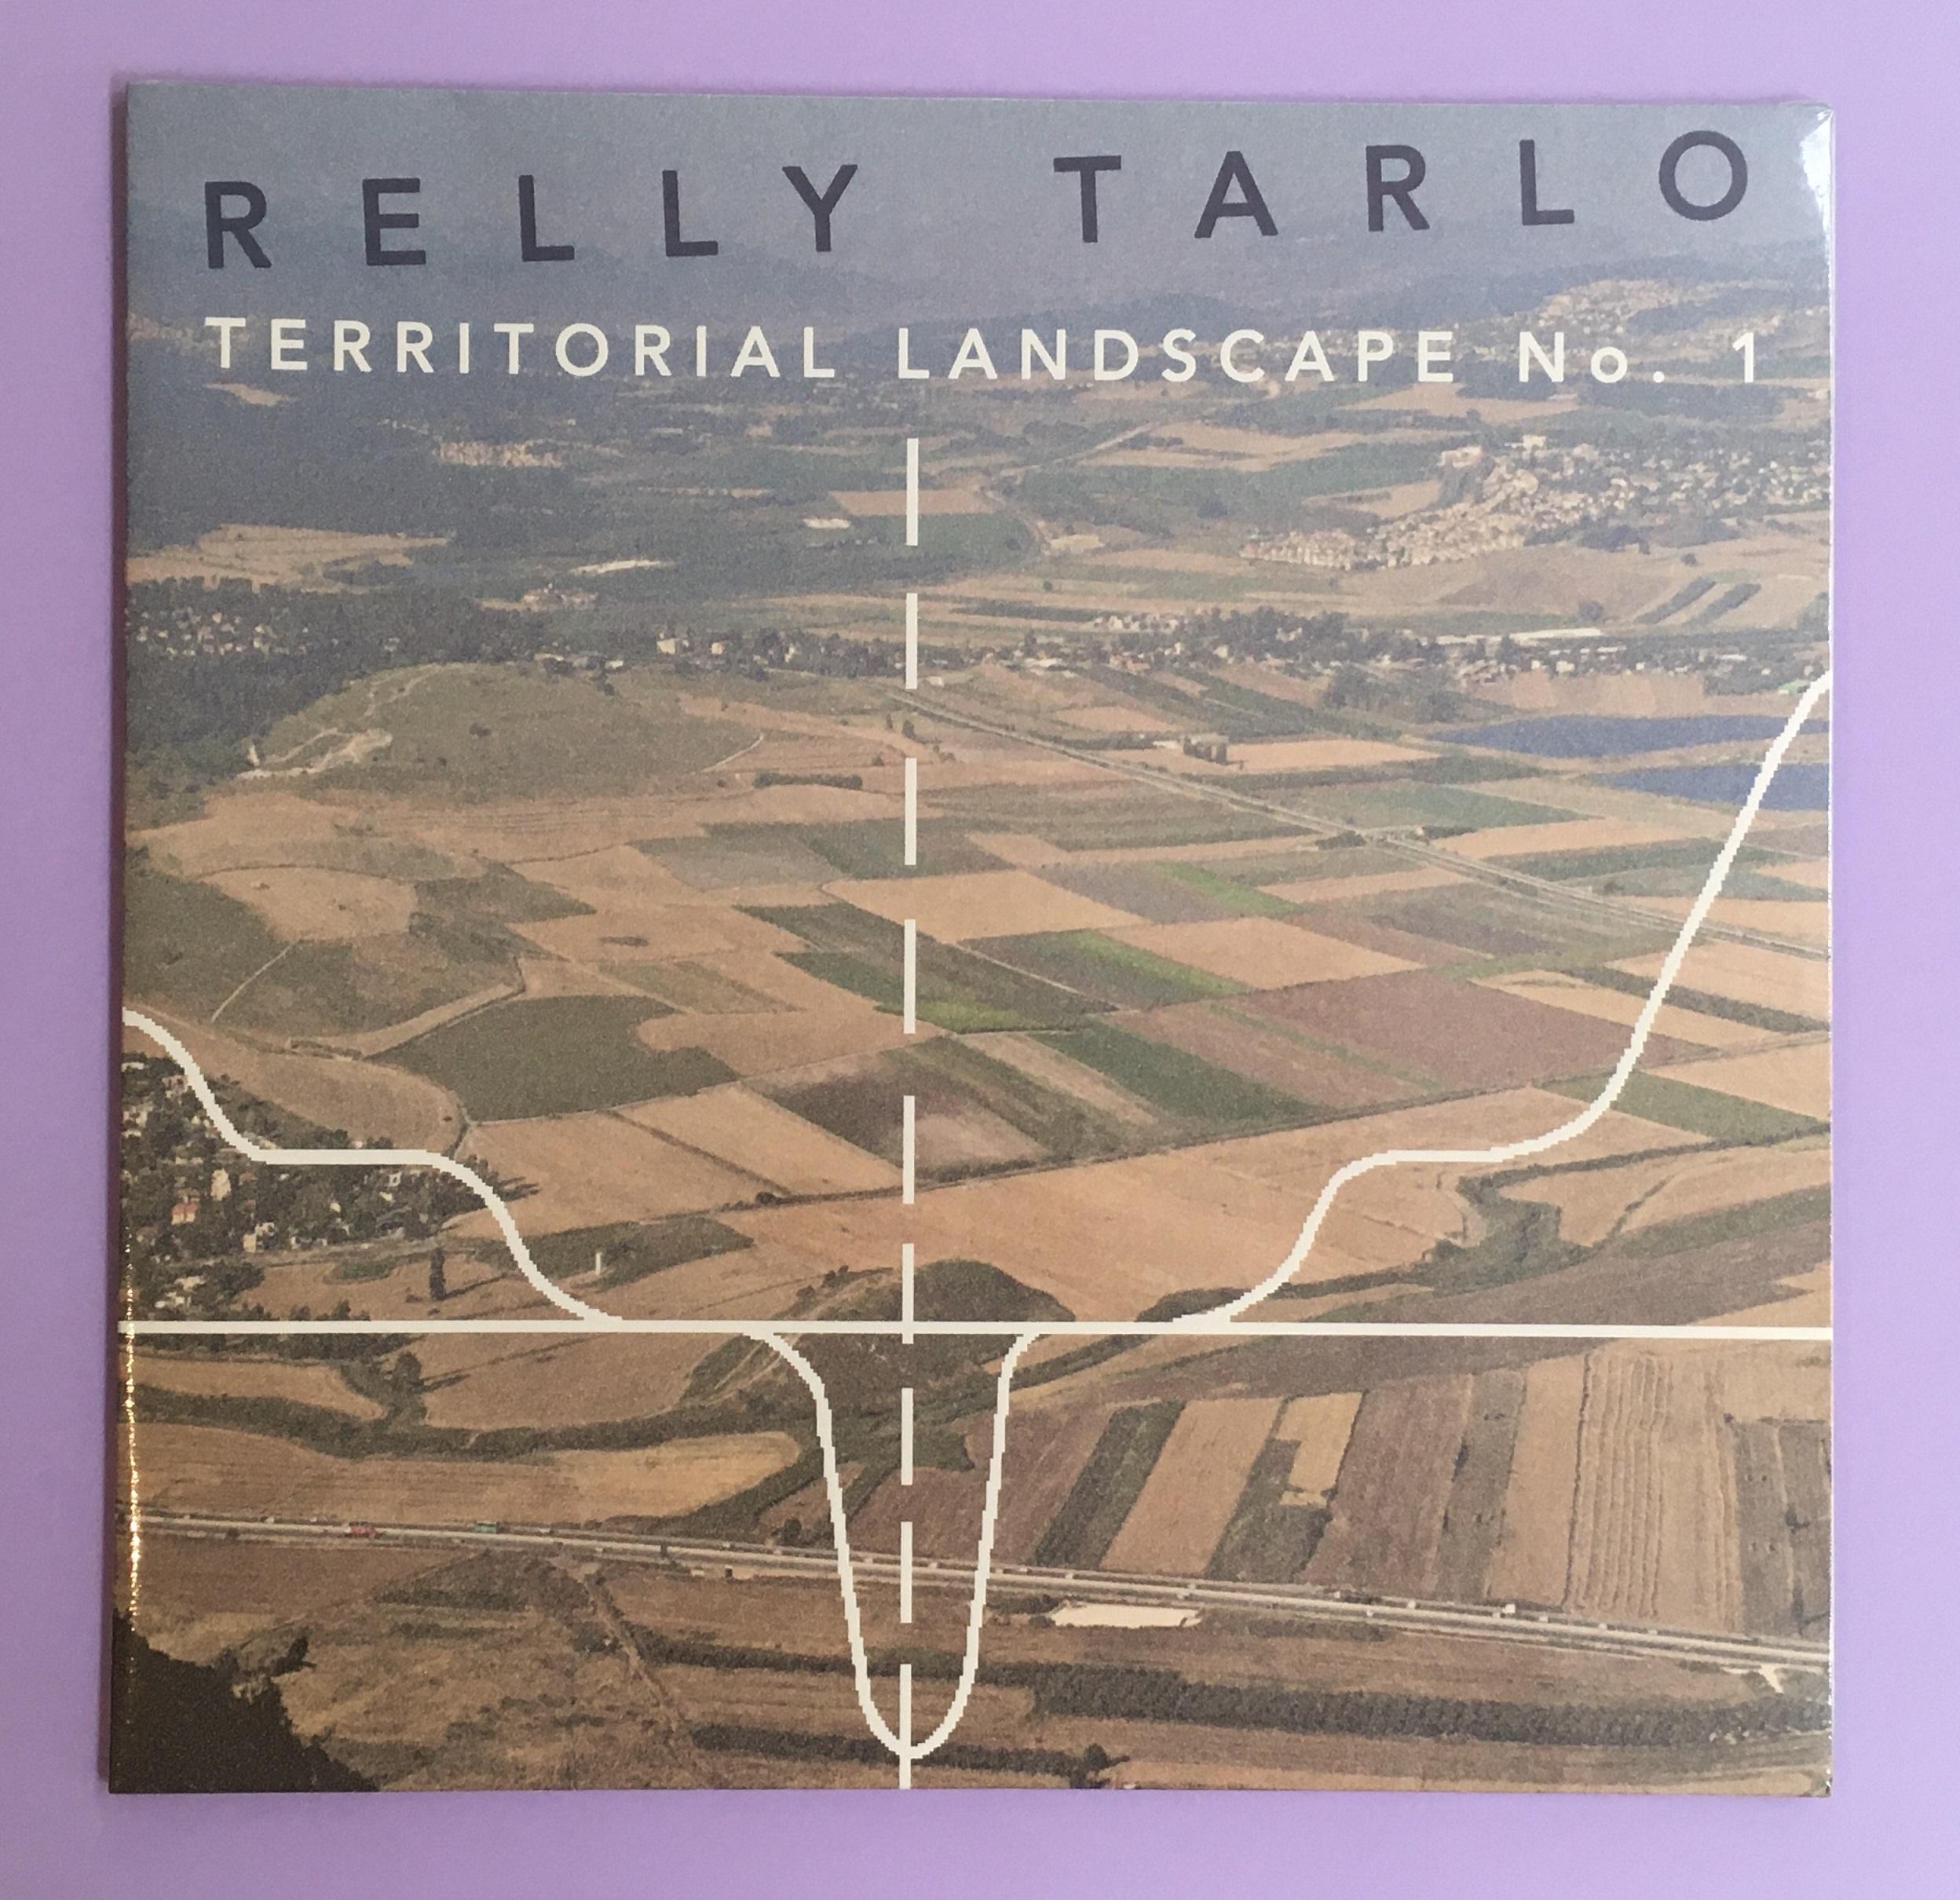 Territorial-Landscape-No-1